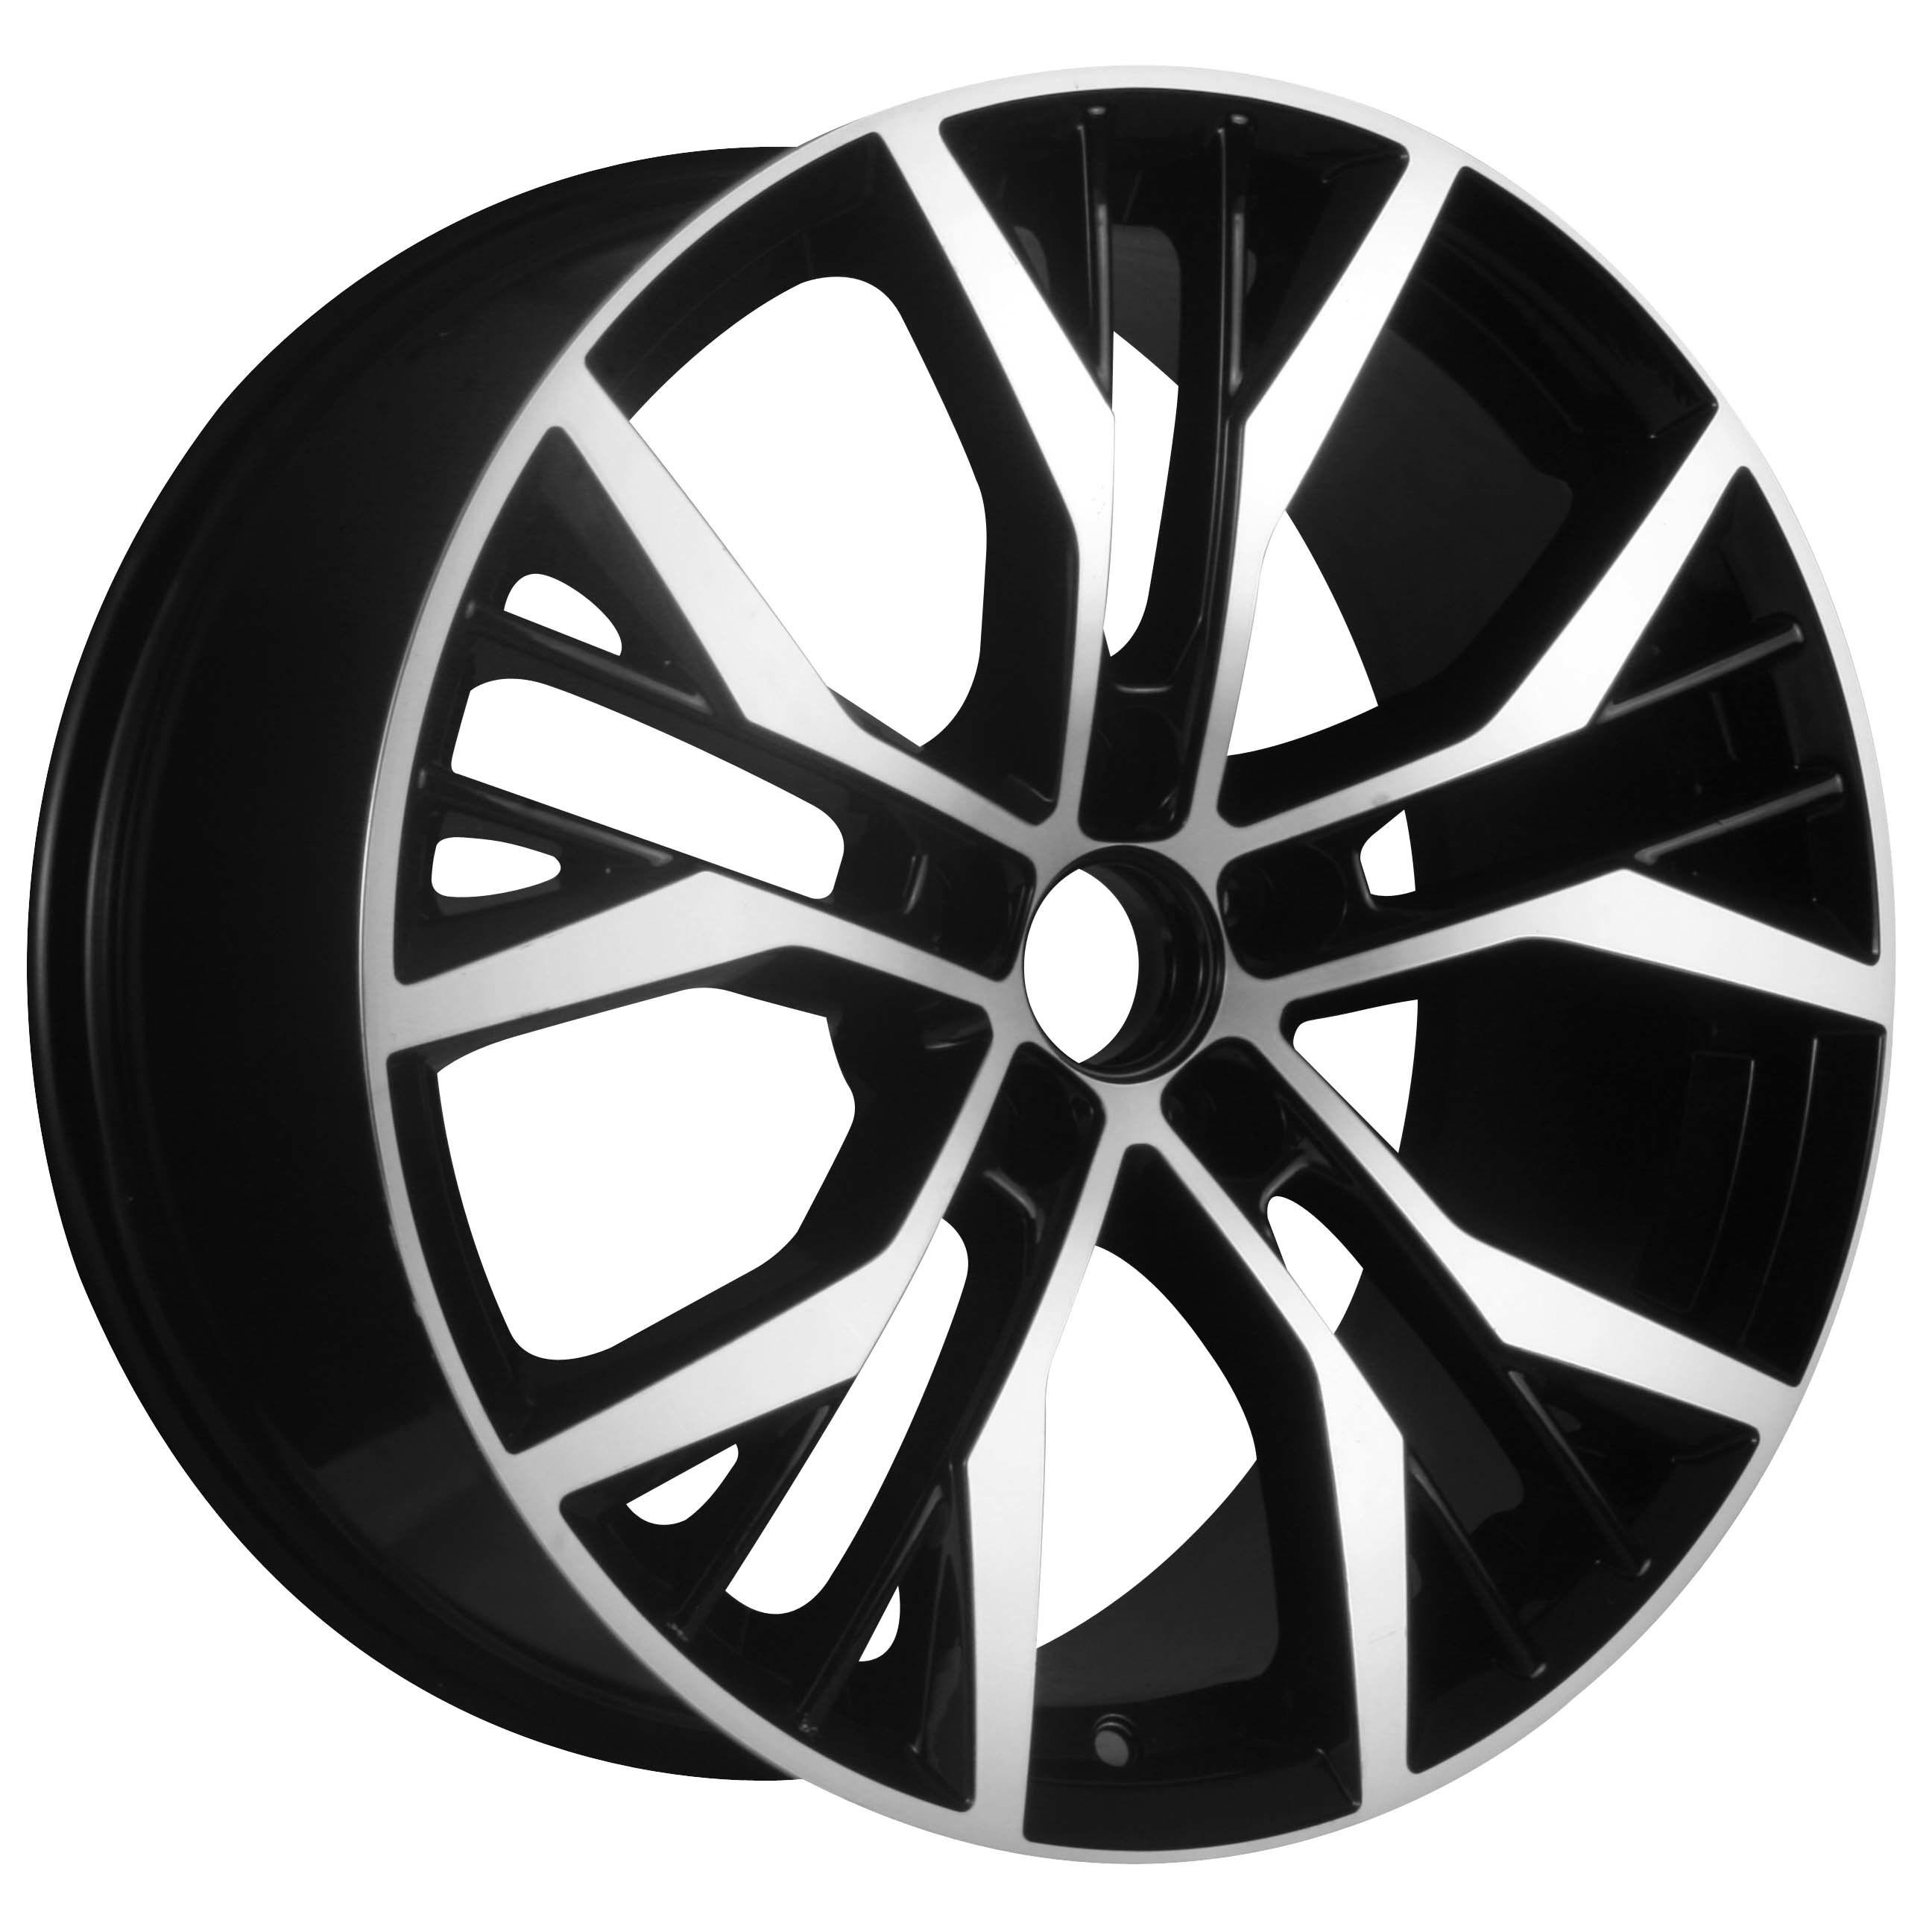 16inch-18inch Alloy Wheel Replica Wheel for VW Golf Gti 2014